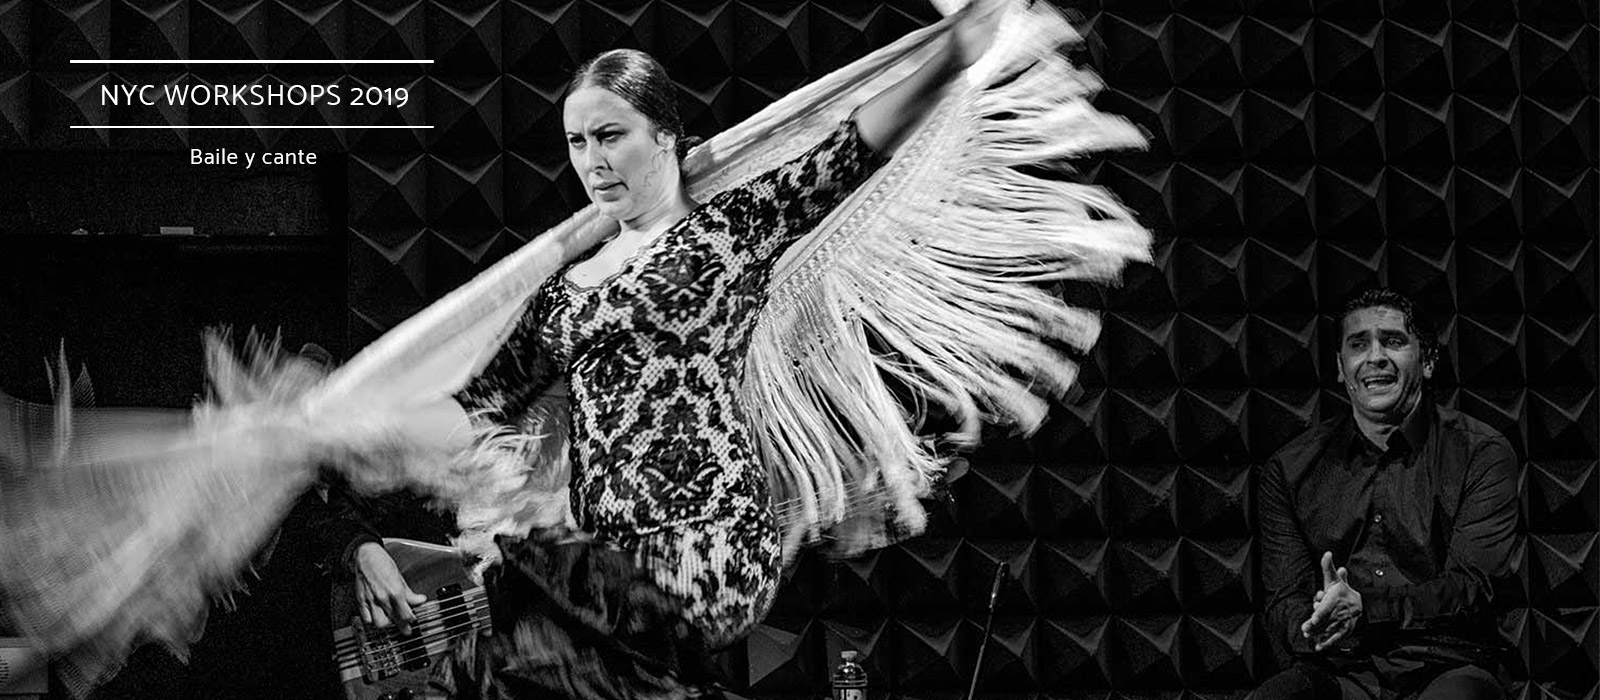 Sonia Olla e Ismael Fernández - Clases de flamenco en Nueva York